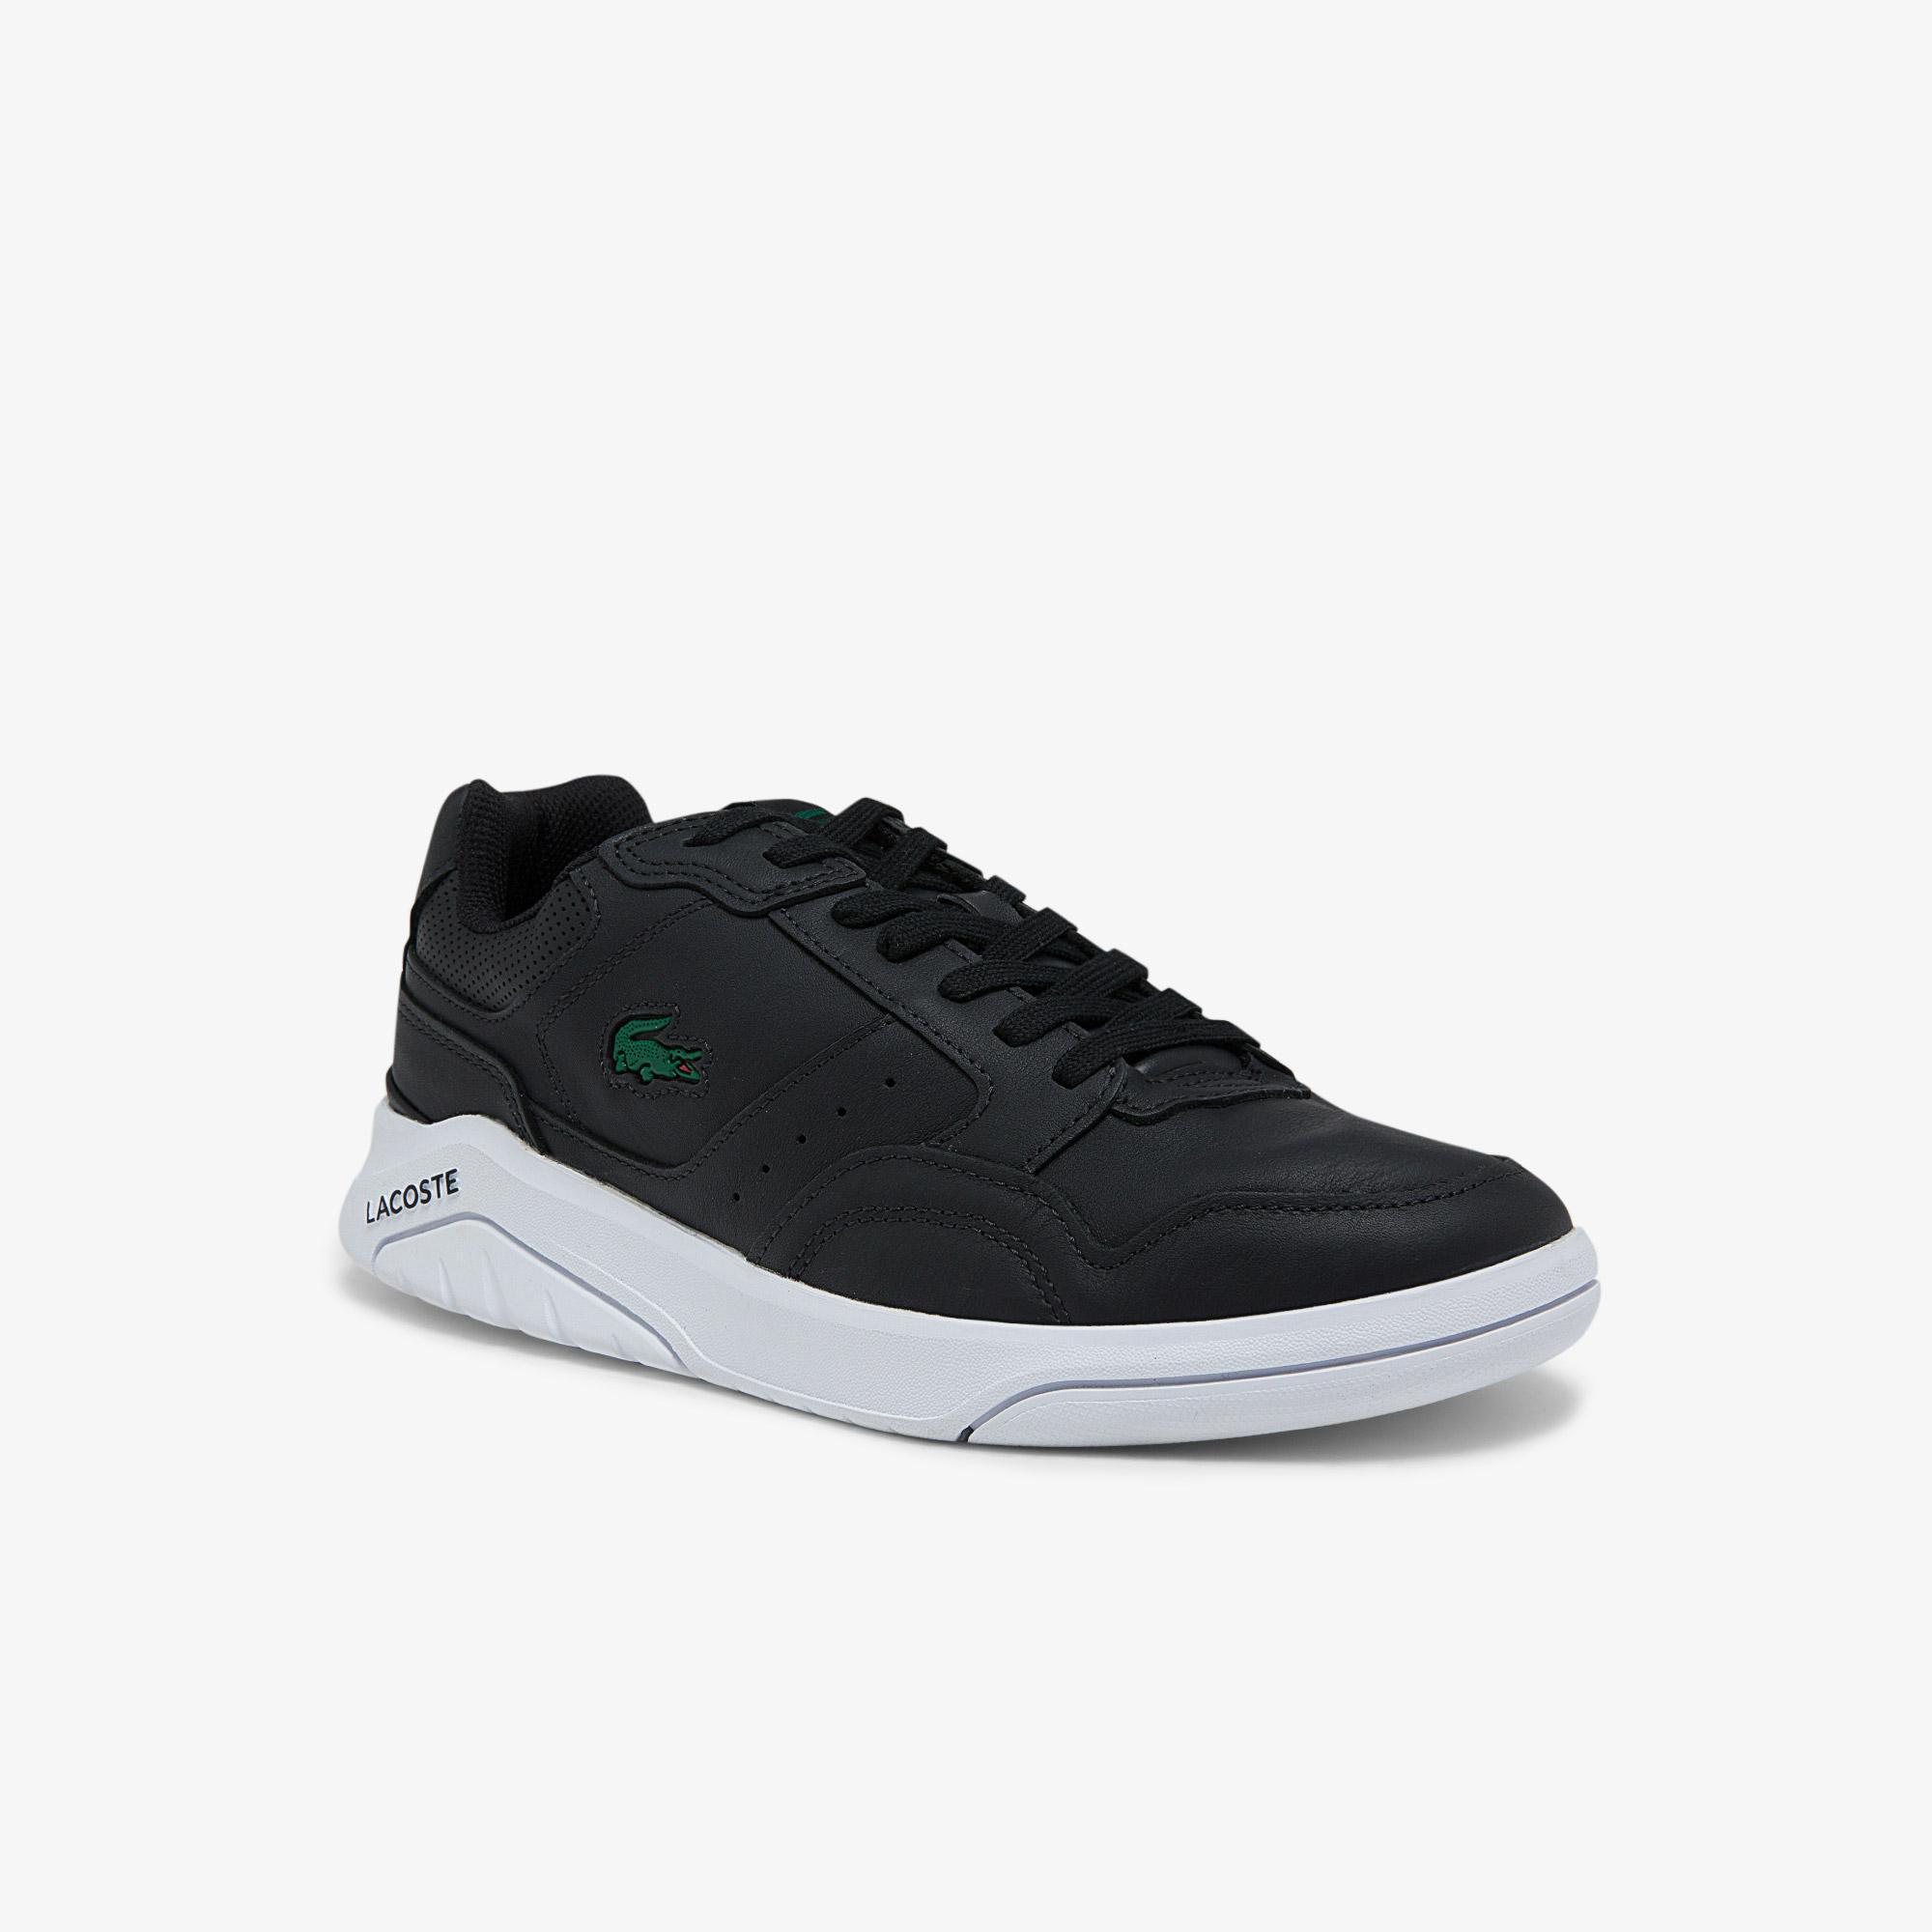 Lacoste Game Advance Luxe01212Sma Erkek Deri Siyah - Beyaz Sneaker